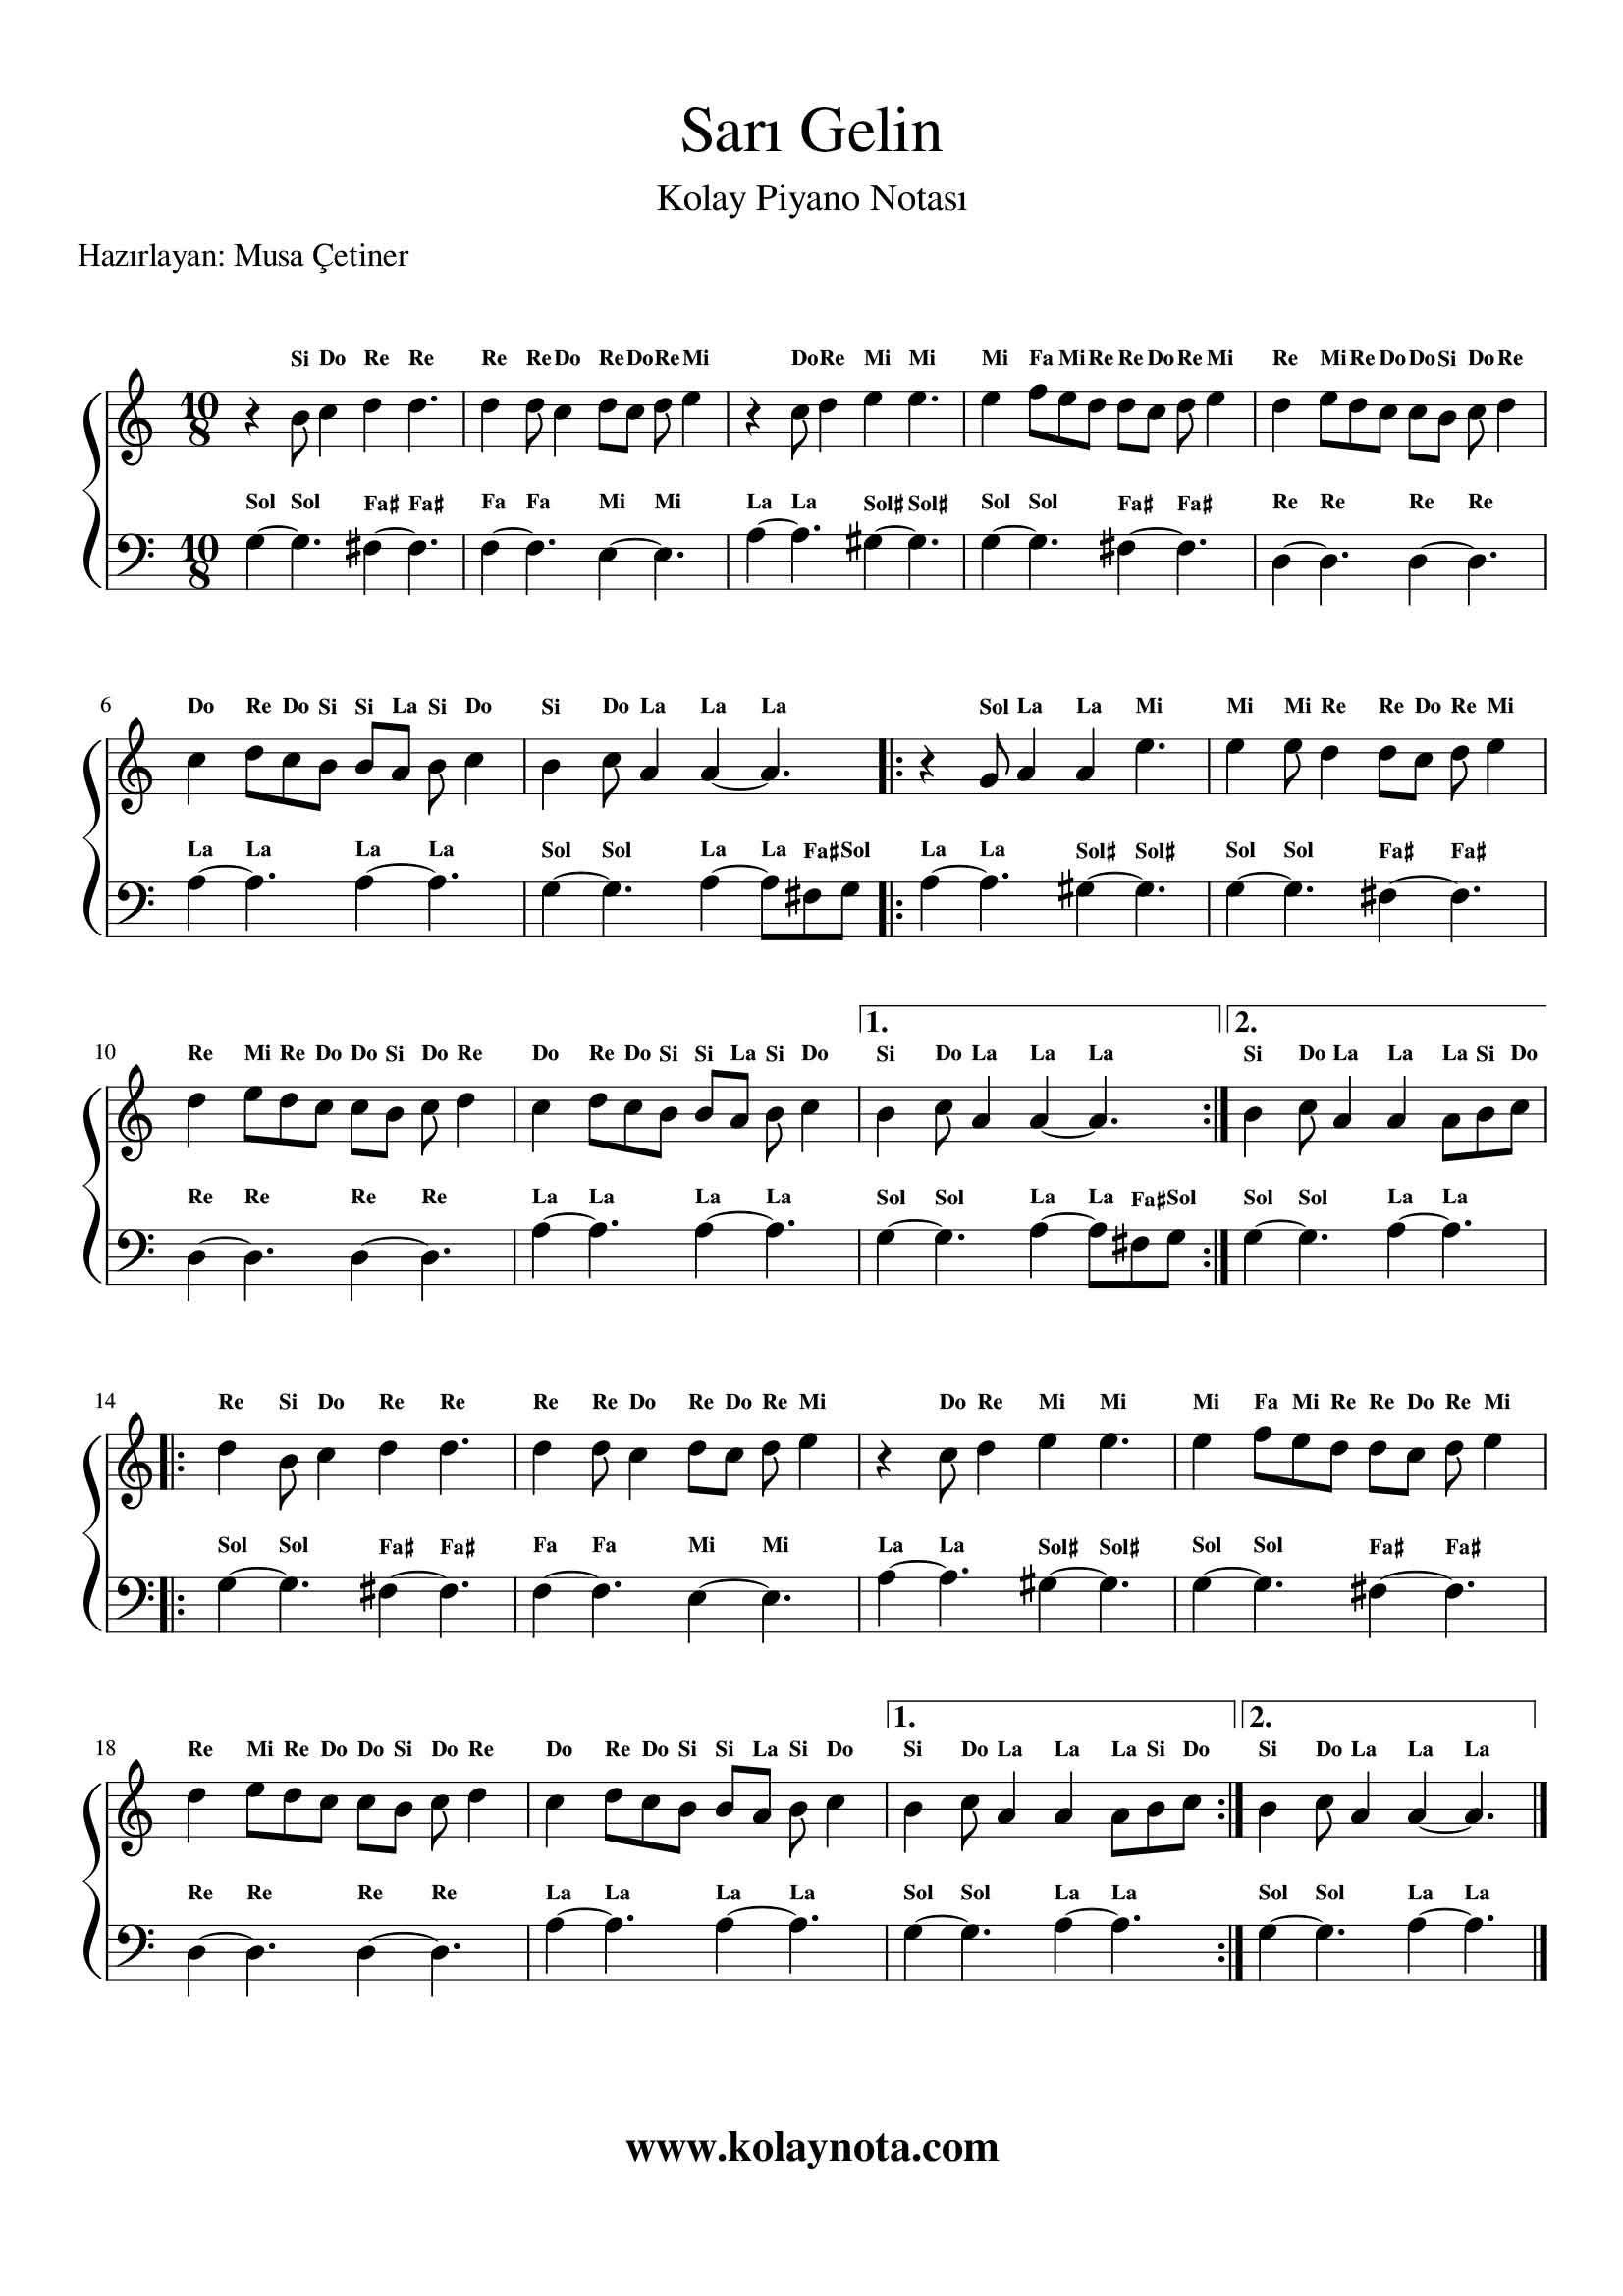 Sari Gelin Kolay Piyano Notasi Kolaynota Com Nota Arsivi Sarisin Gelin Pi Yano Muzik Notalari